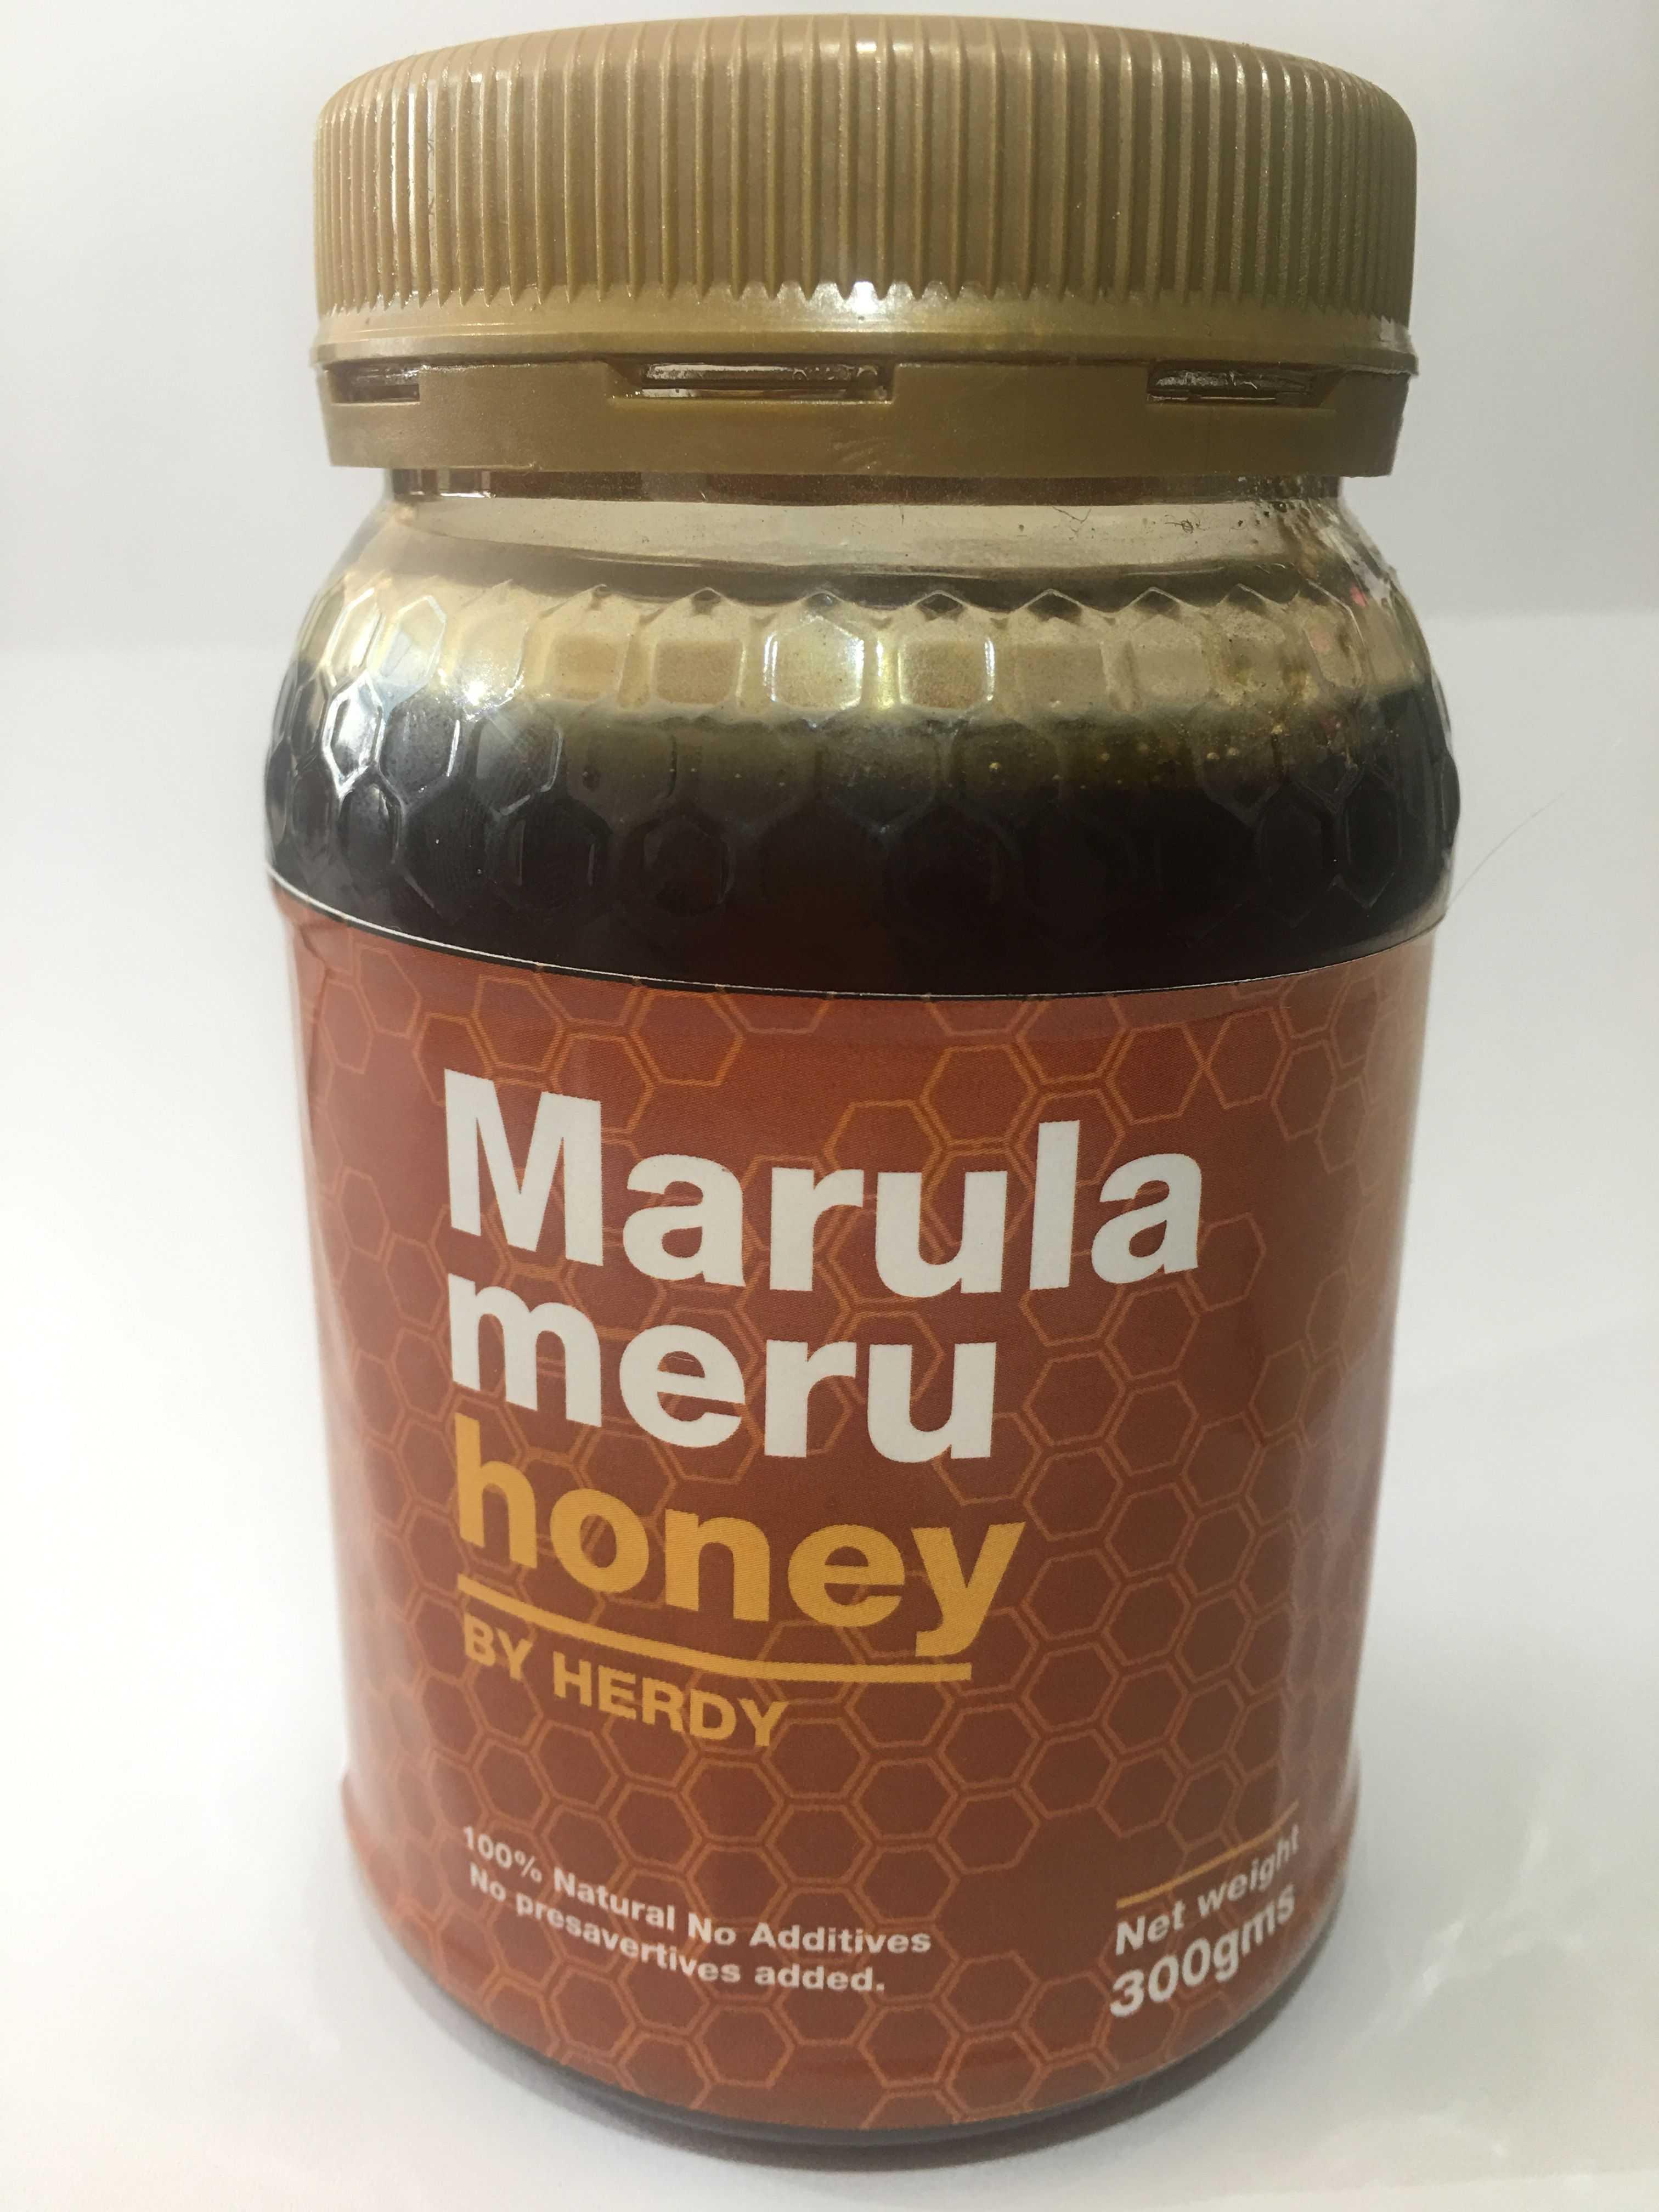 Marula Meru Honey - 500 grams